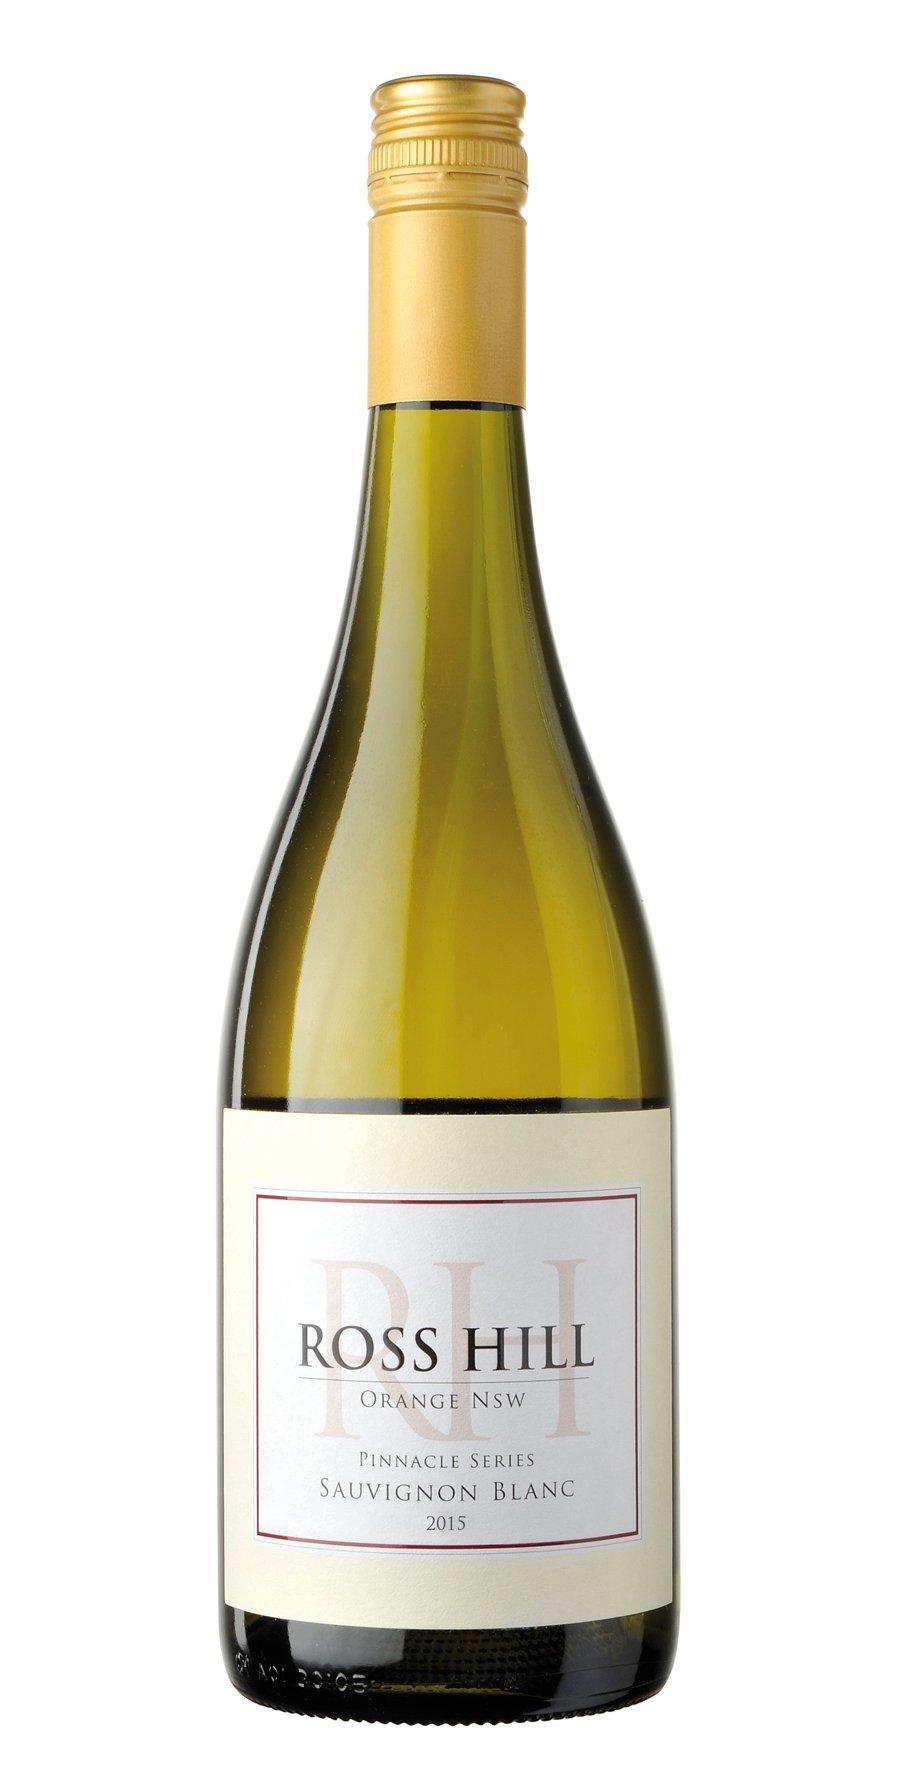 Ross Hill 2016 Pinnacle Series Sauvignon Blanc - Orange NSW